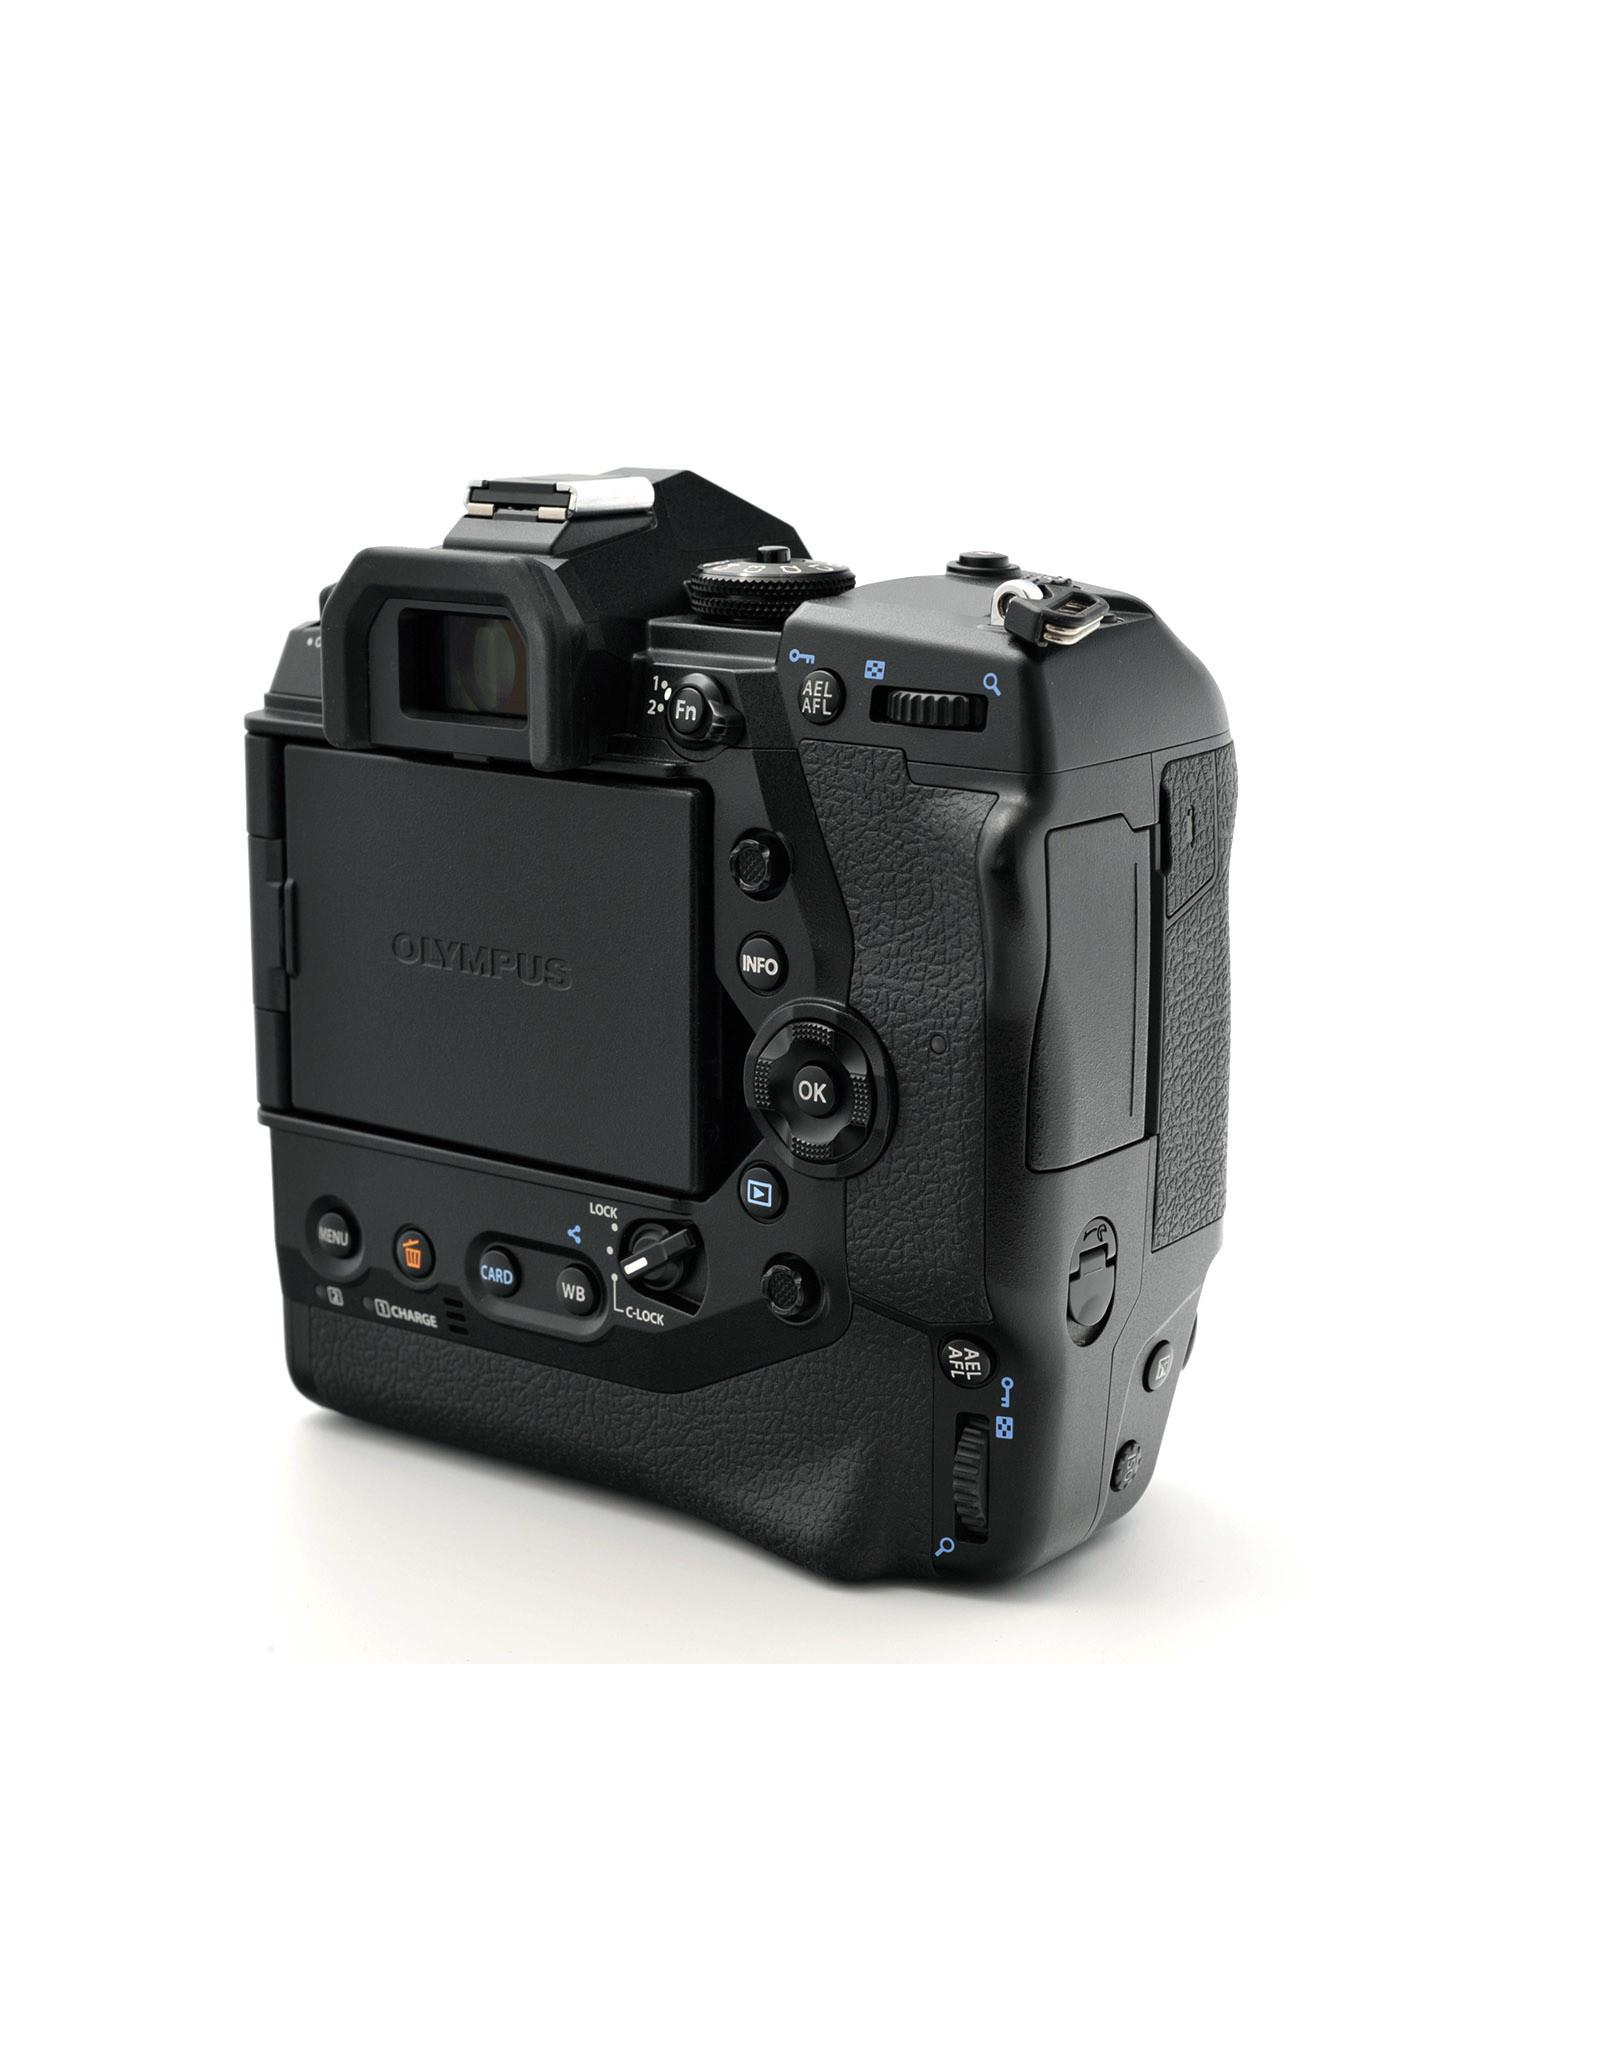 Nikon Olympus OM-D E-M1X   AP1051207